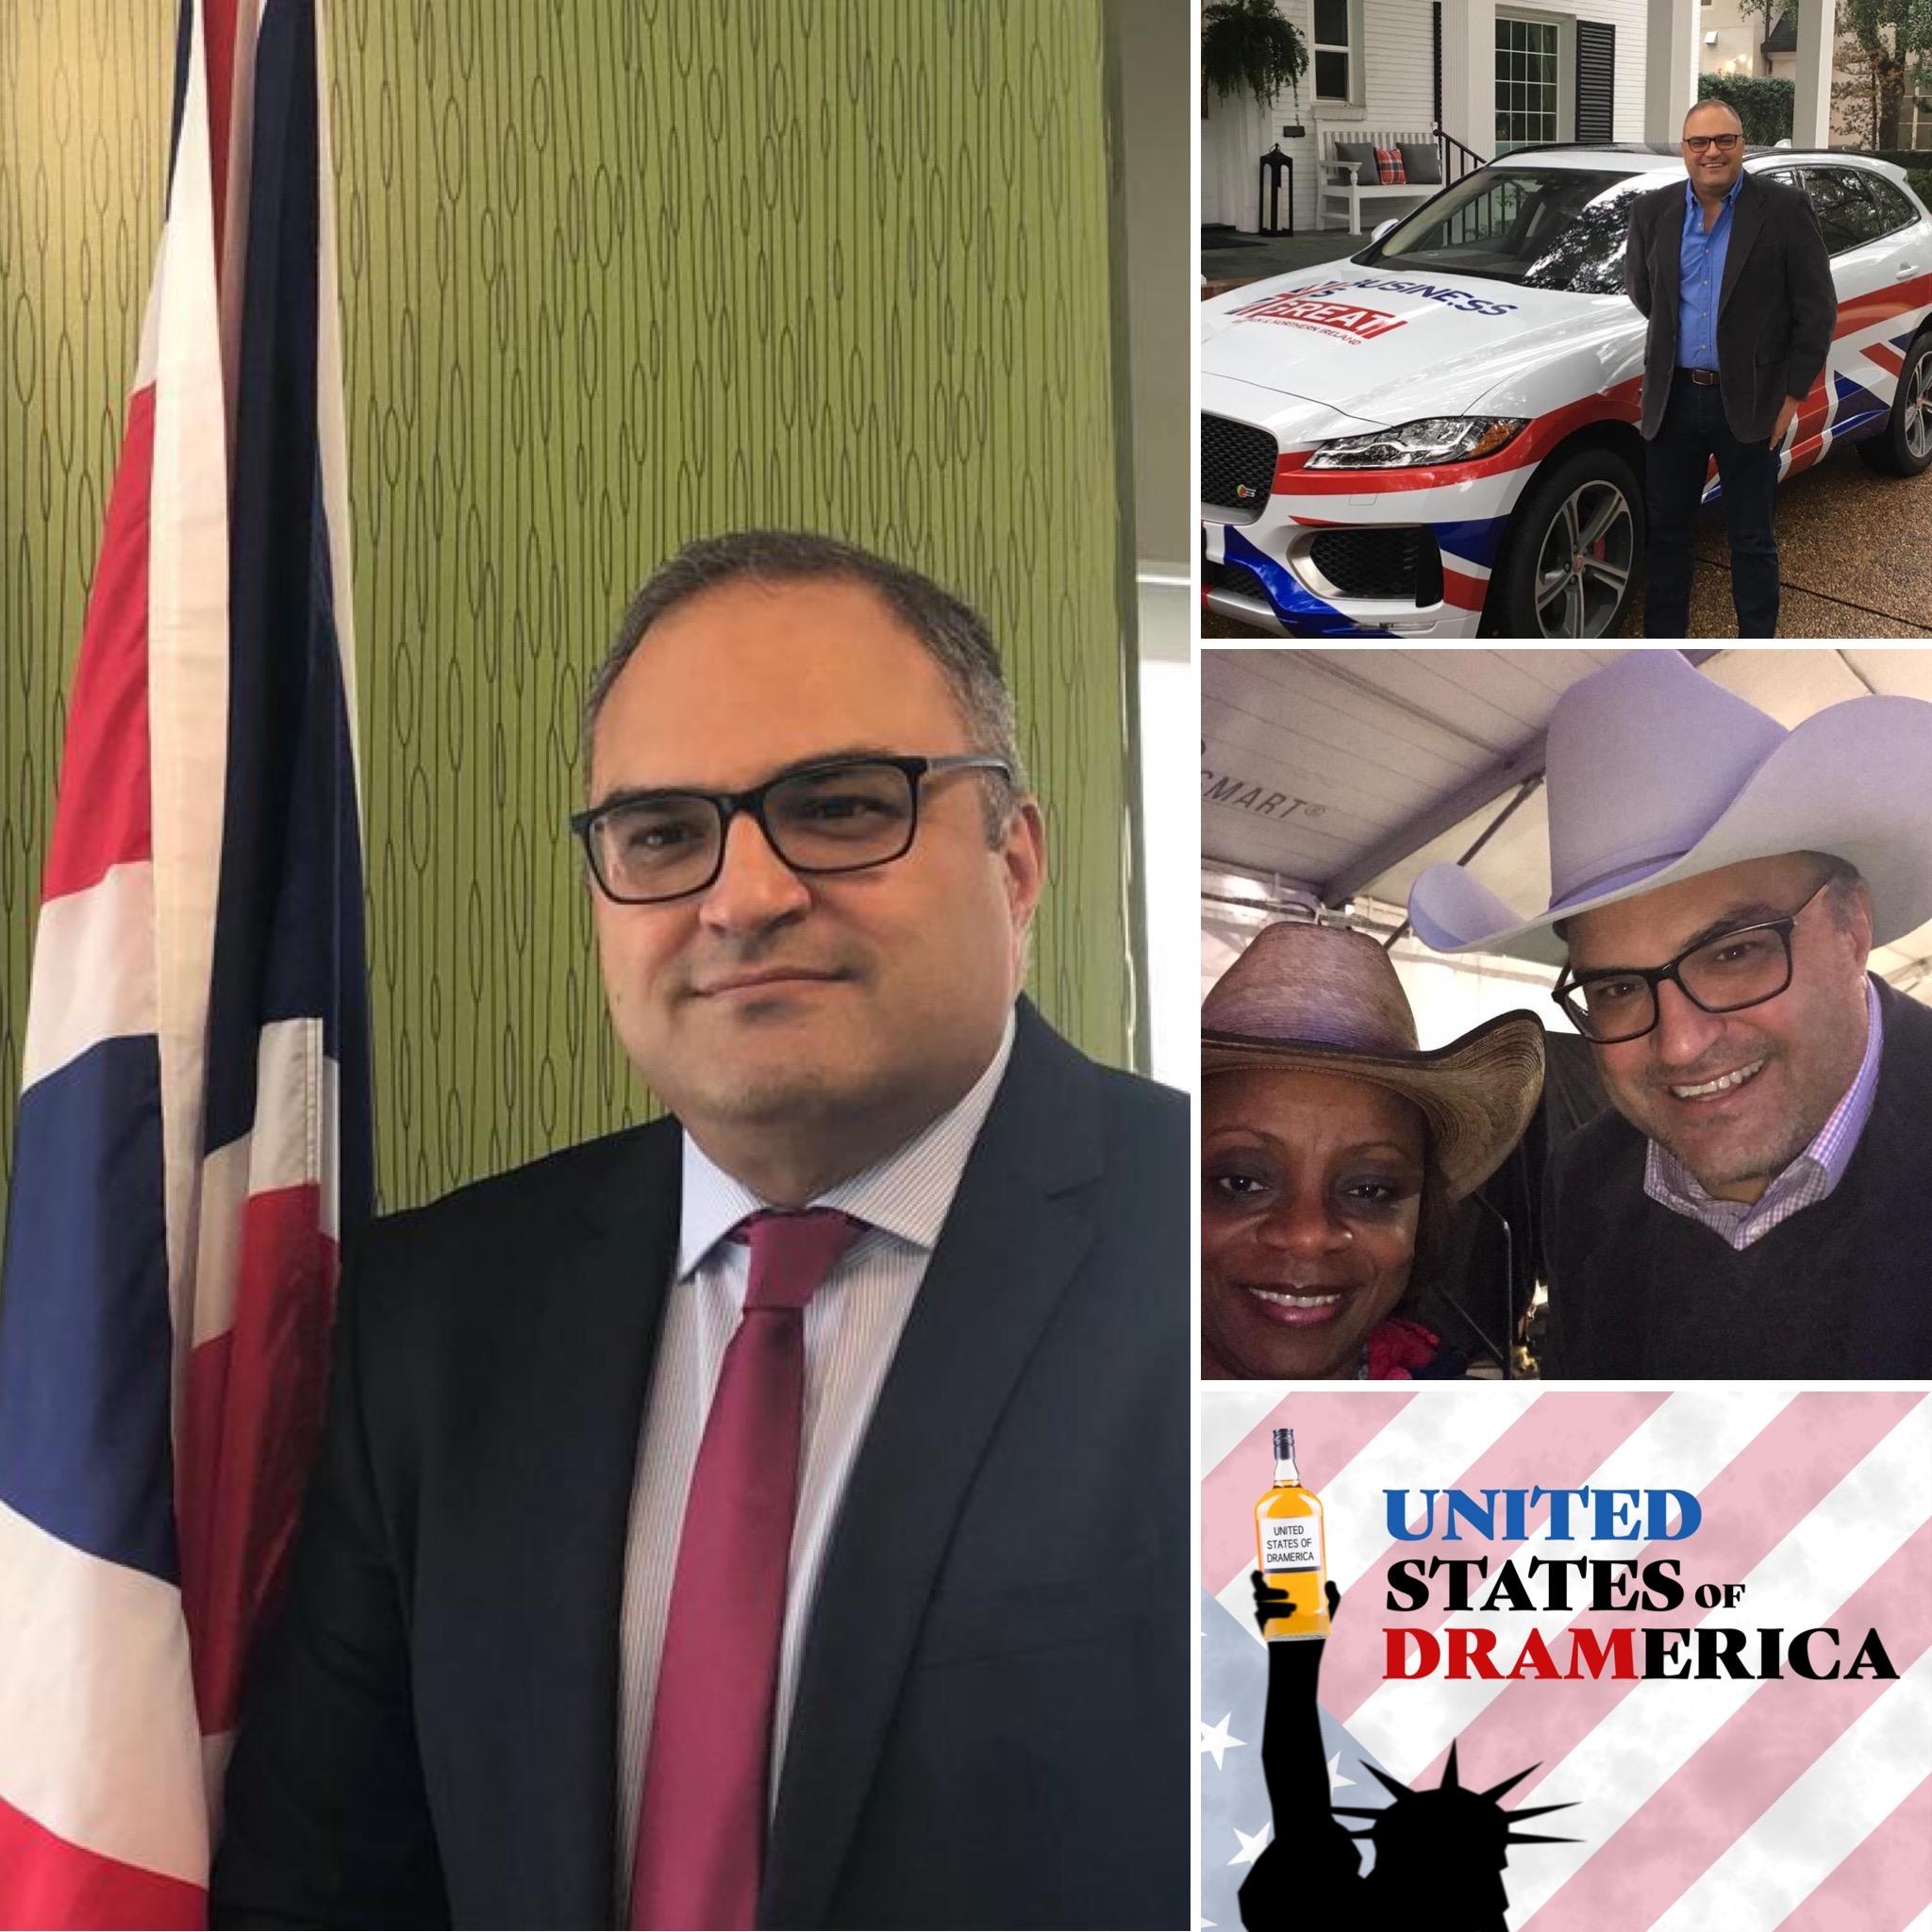 Episode 43 - Richard Hyde, British Consul General in Texas